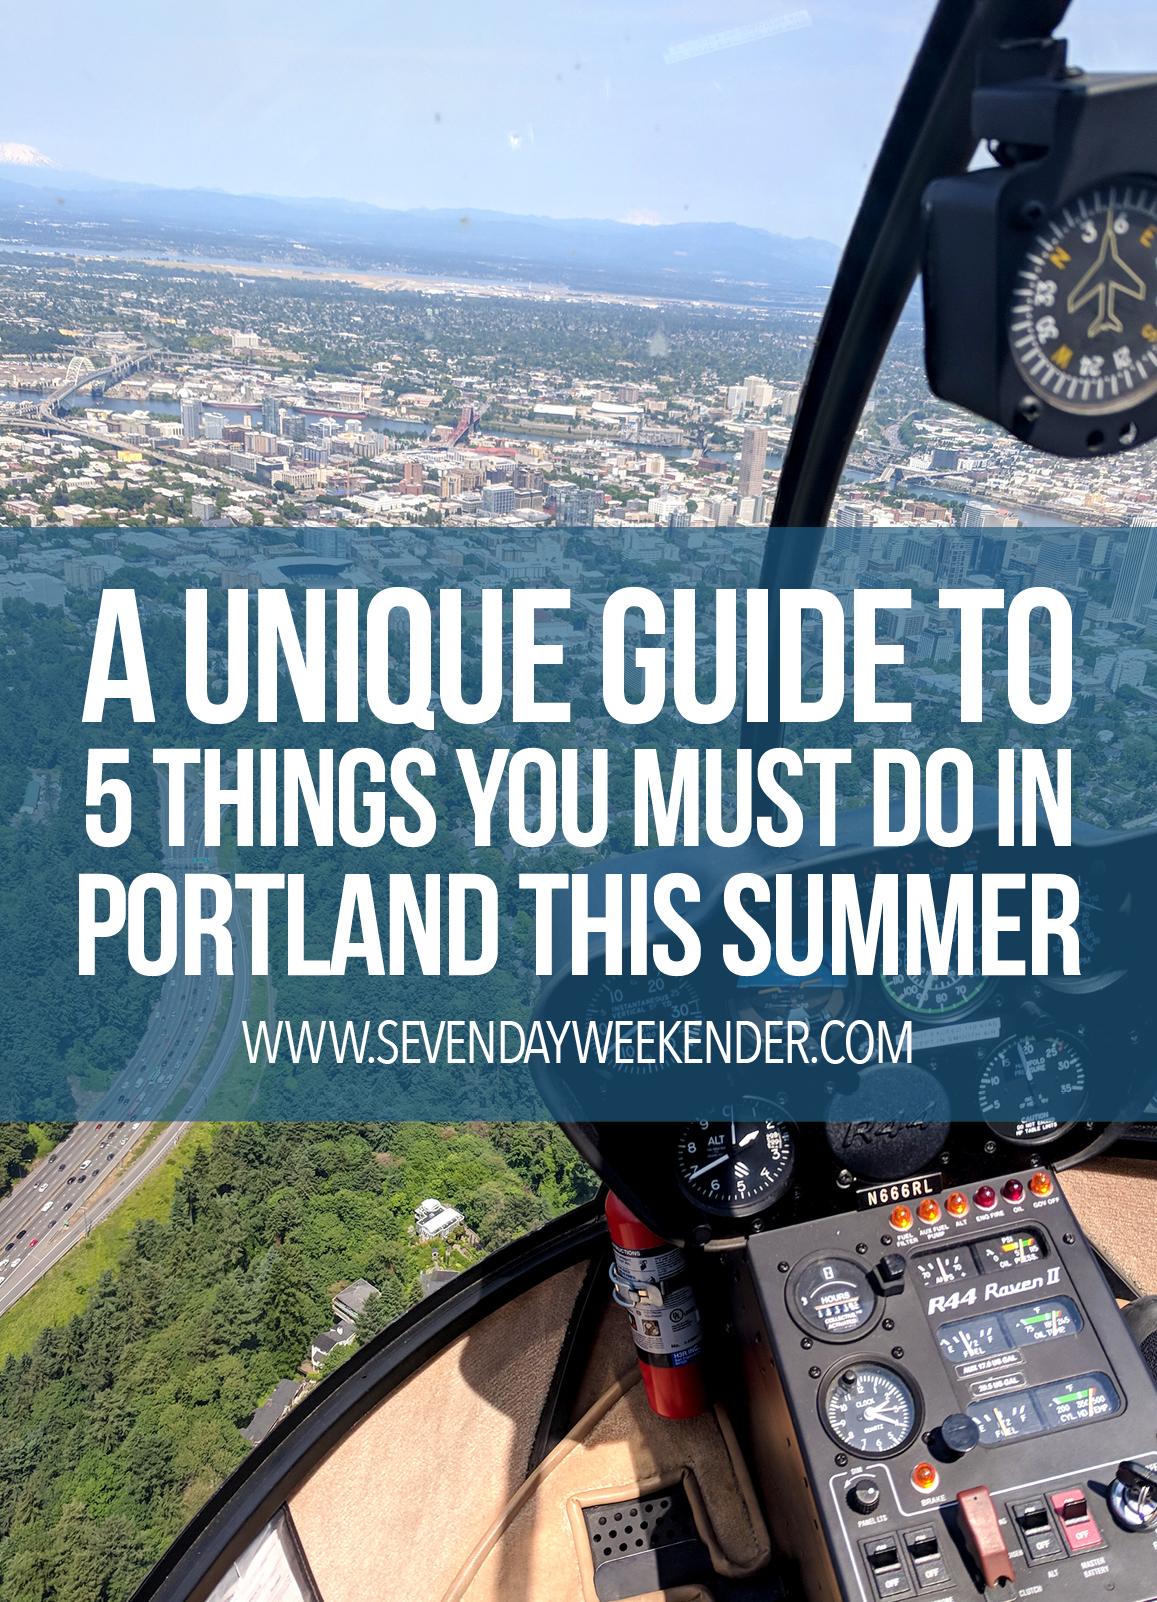 Unique Guide to Portland in Summer